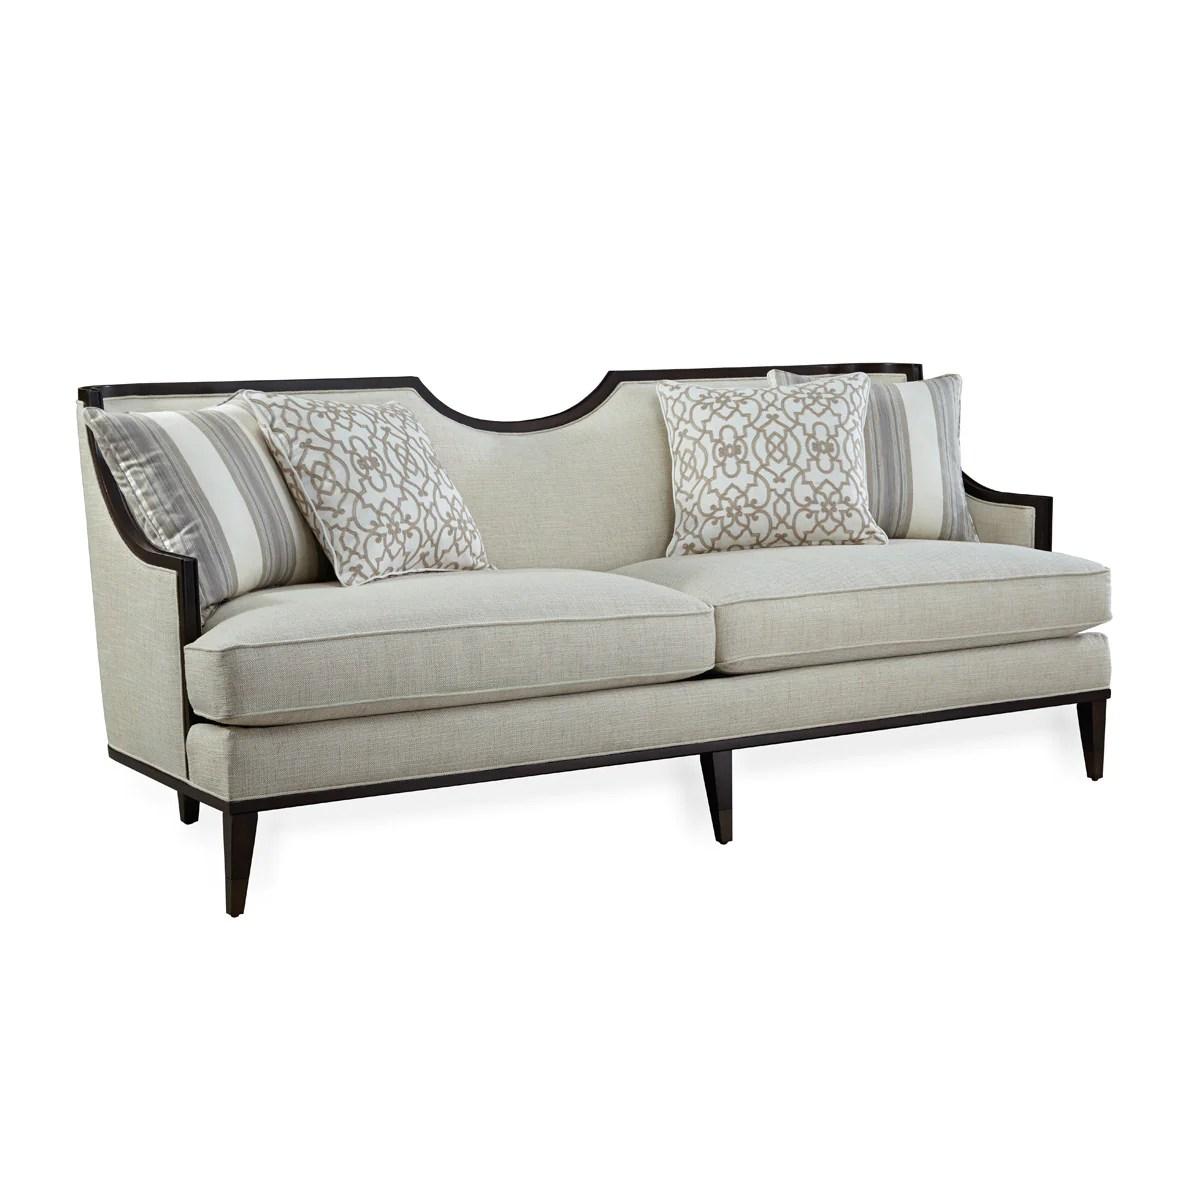 single sofa bed gold coast leather ebay uk barletta